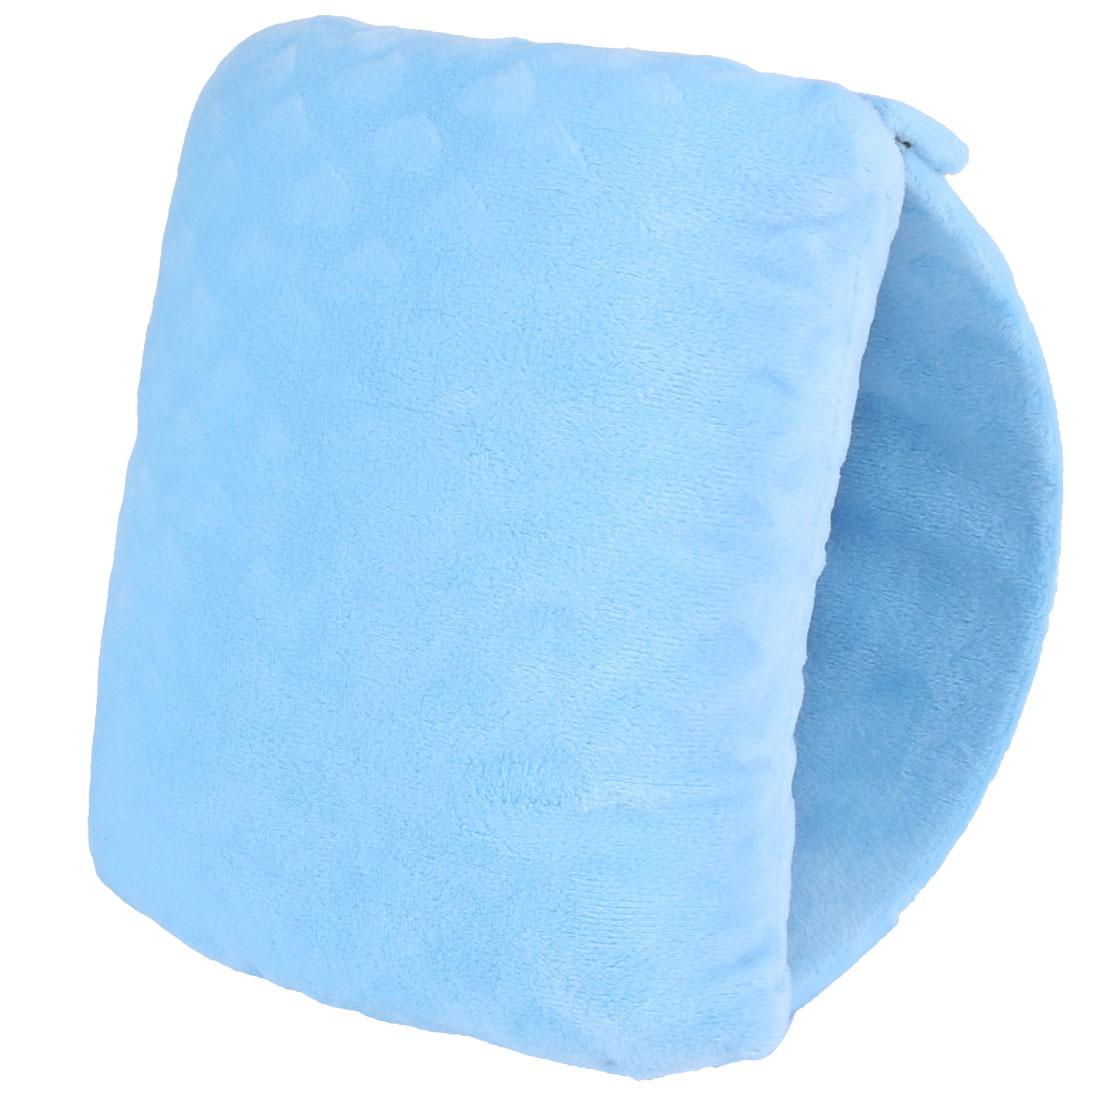 School Office Plush Coated Portable Travel Sleep Soft Nap Pillow Cushion Sky Blue